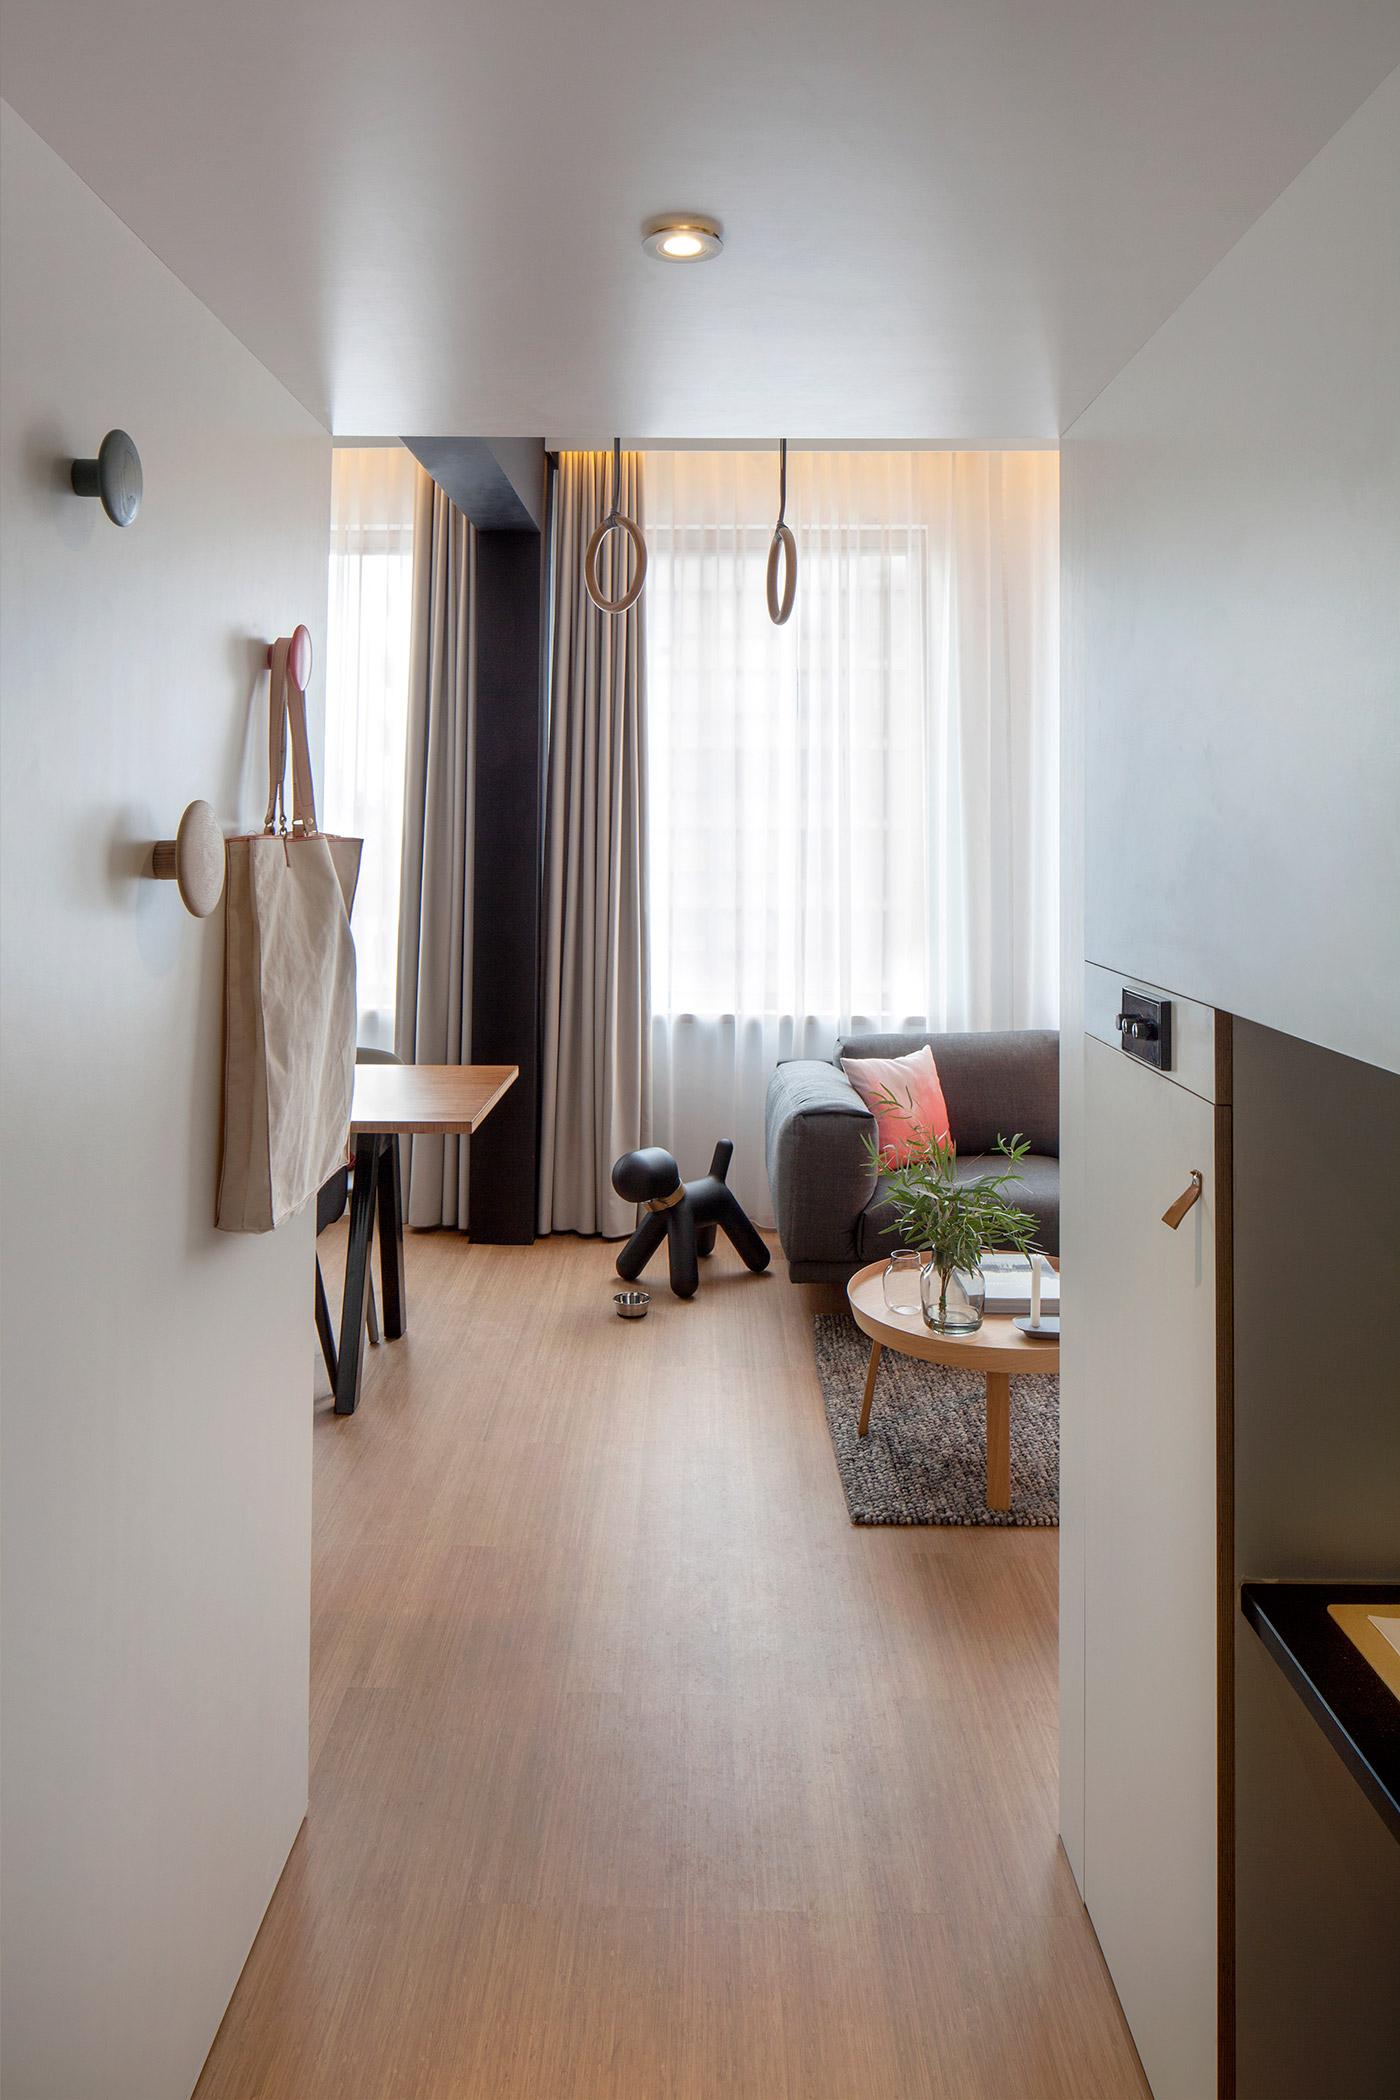 Скульптура собачки в интерьере квартиры-студии